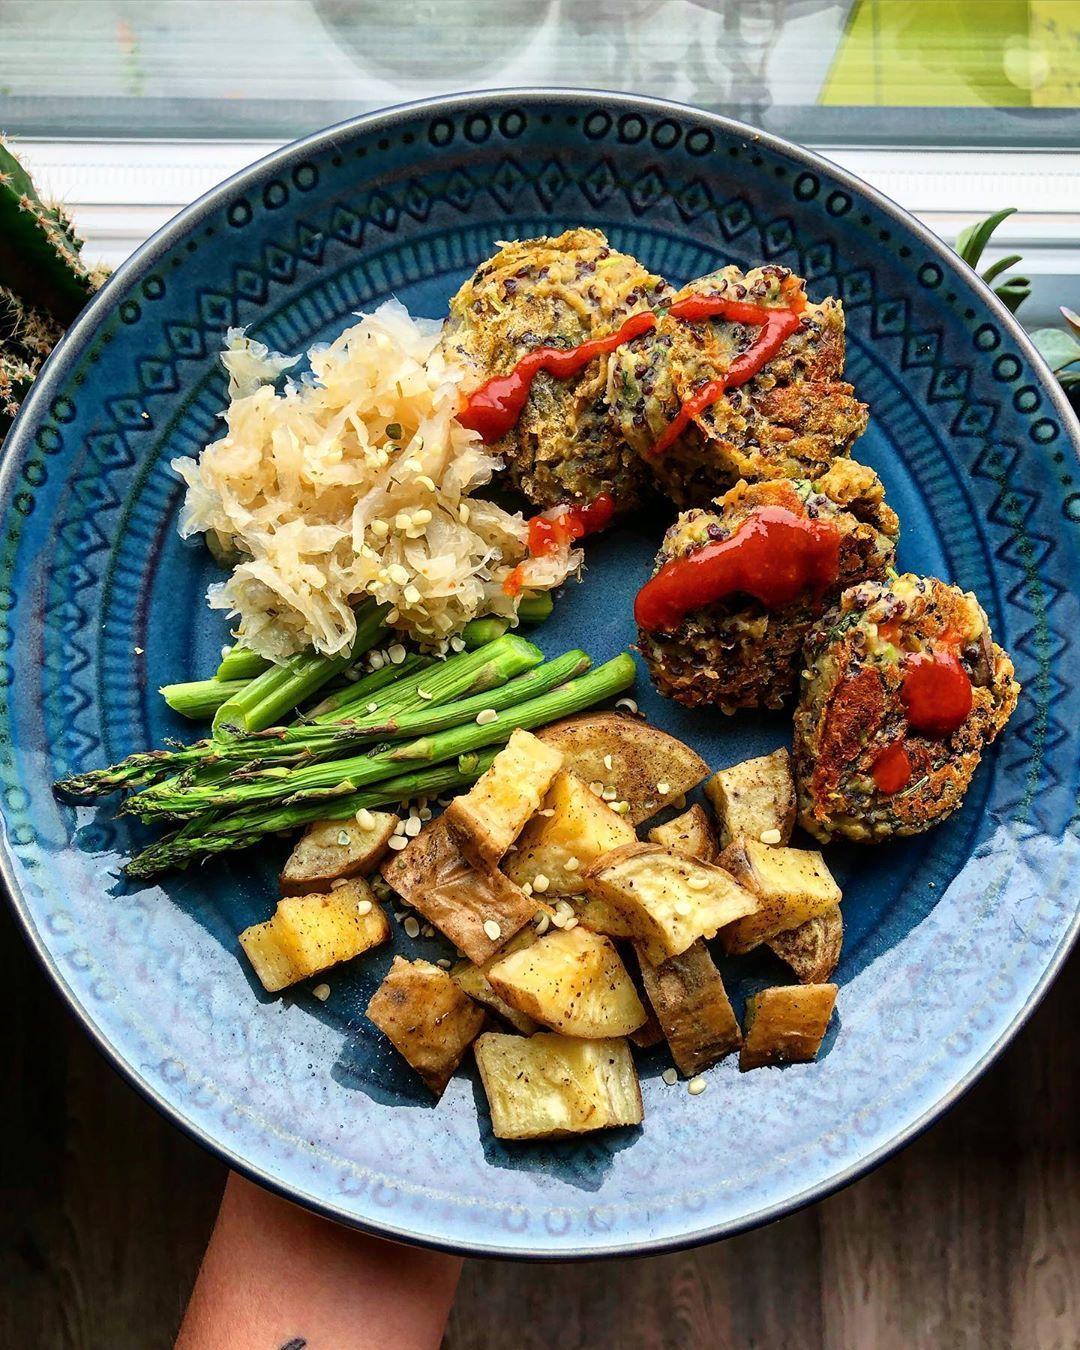 Quinoa chickpea patties, roasted white yams, asparagus and sauerkraut, post-run fuel. . . .